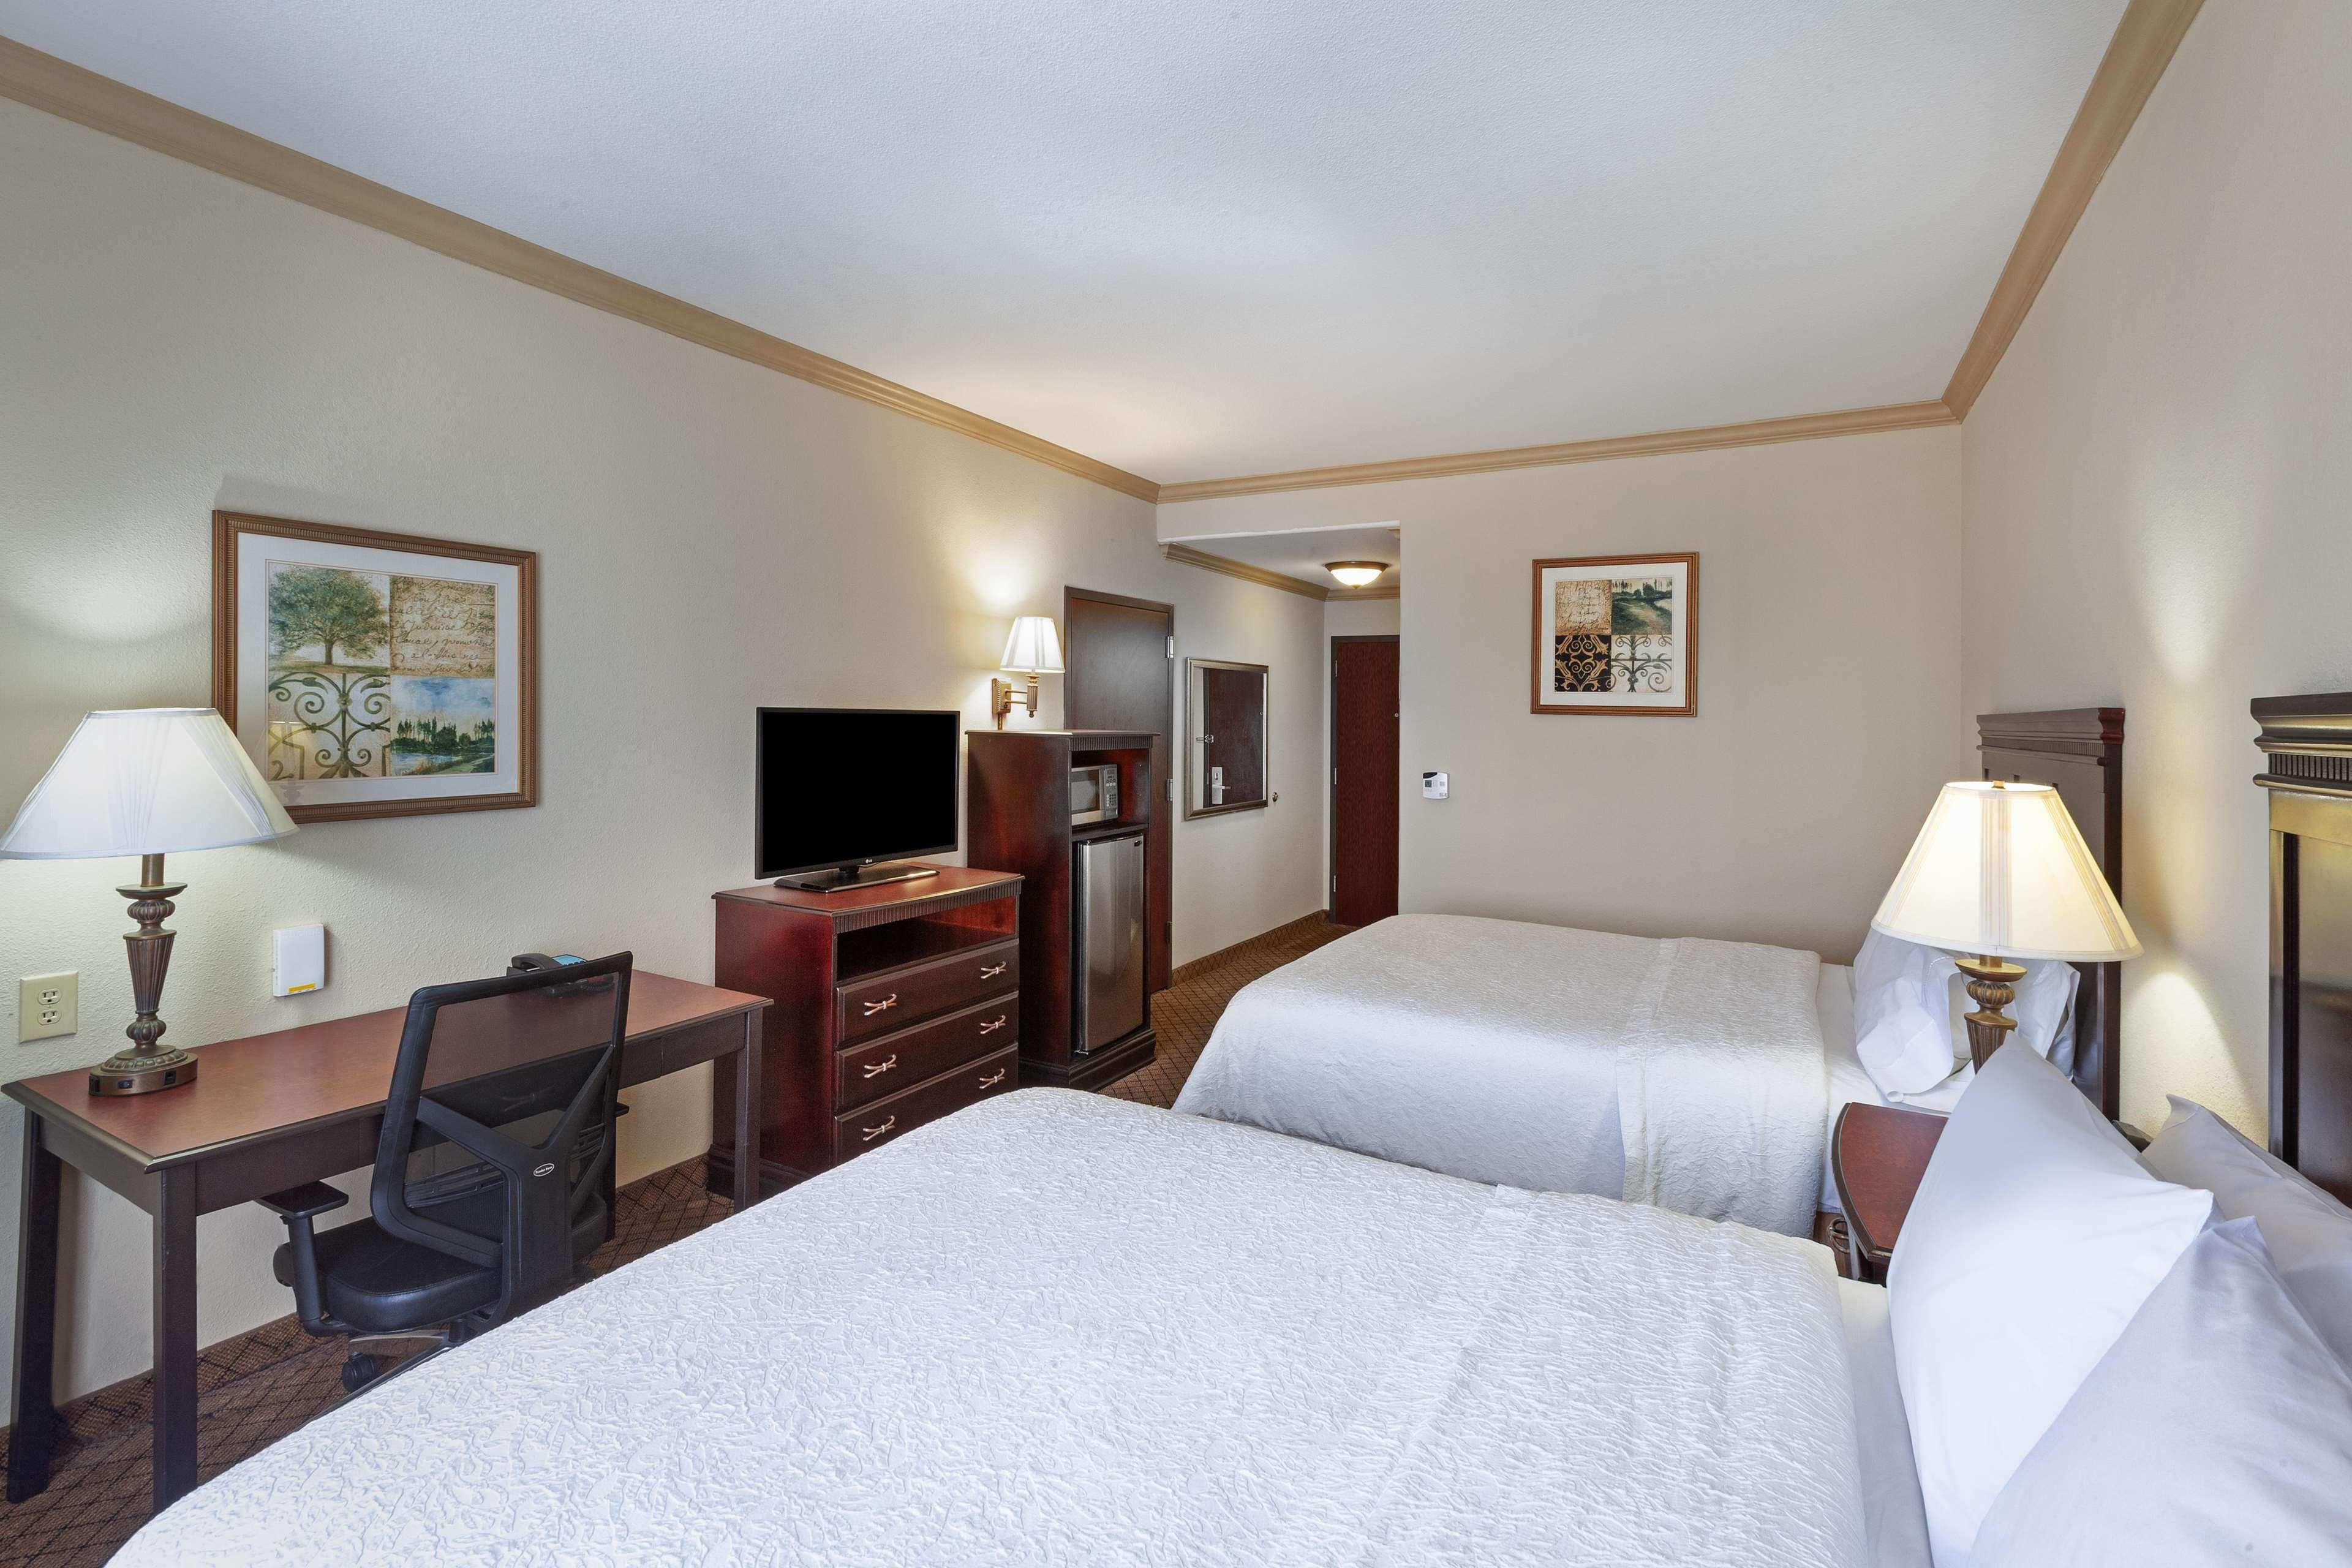 Hampton Inn & Suites Galveston image 22